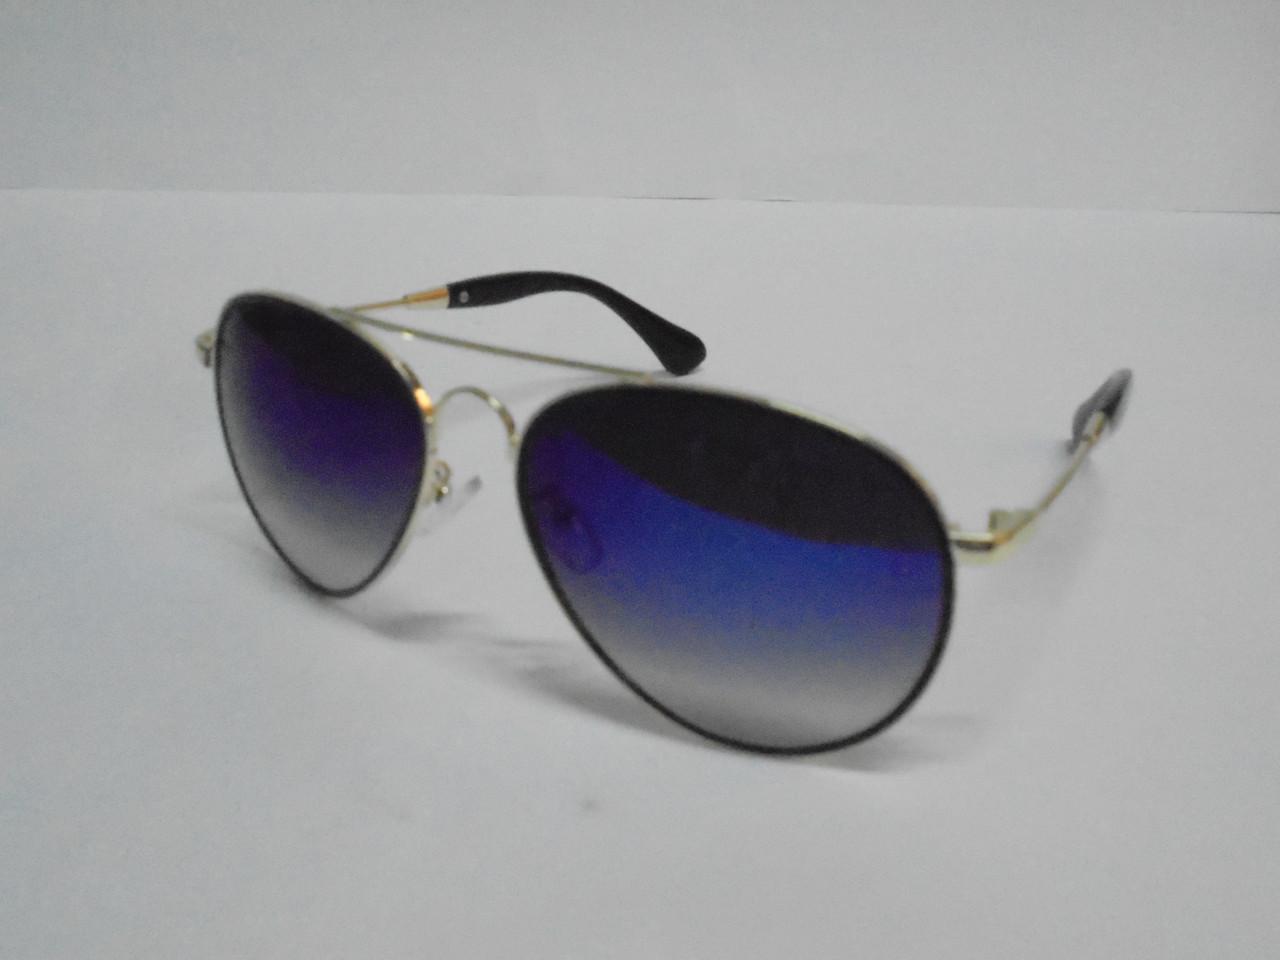 70316fa0e942 Солнцезащитные очки Aviator Ray-Ban 6605, очки авиаторы, модный аксессуар,  очки,